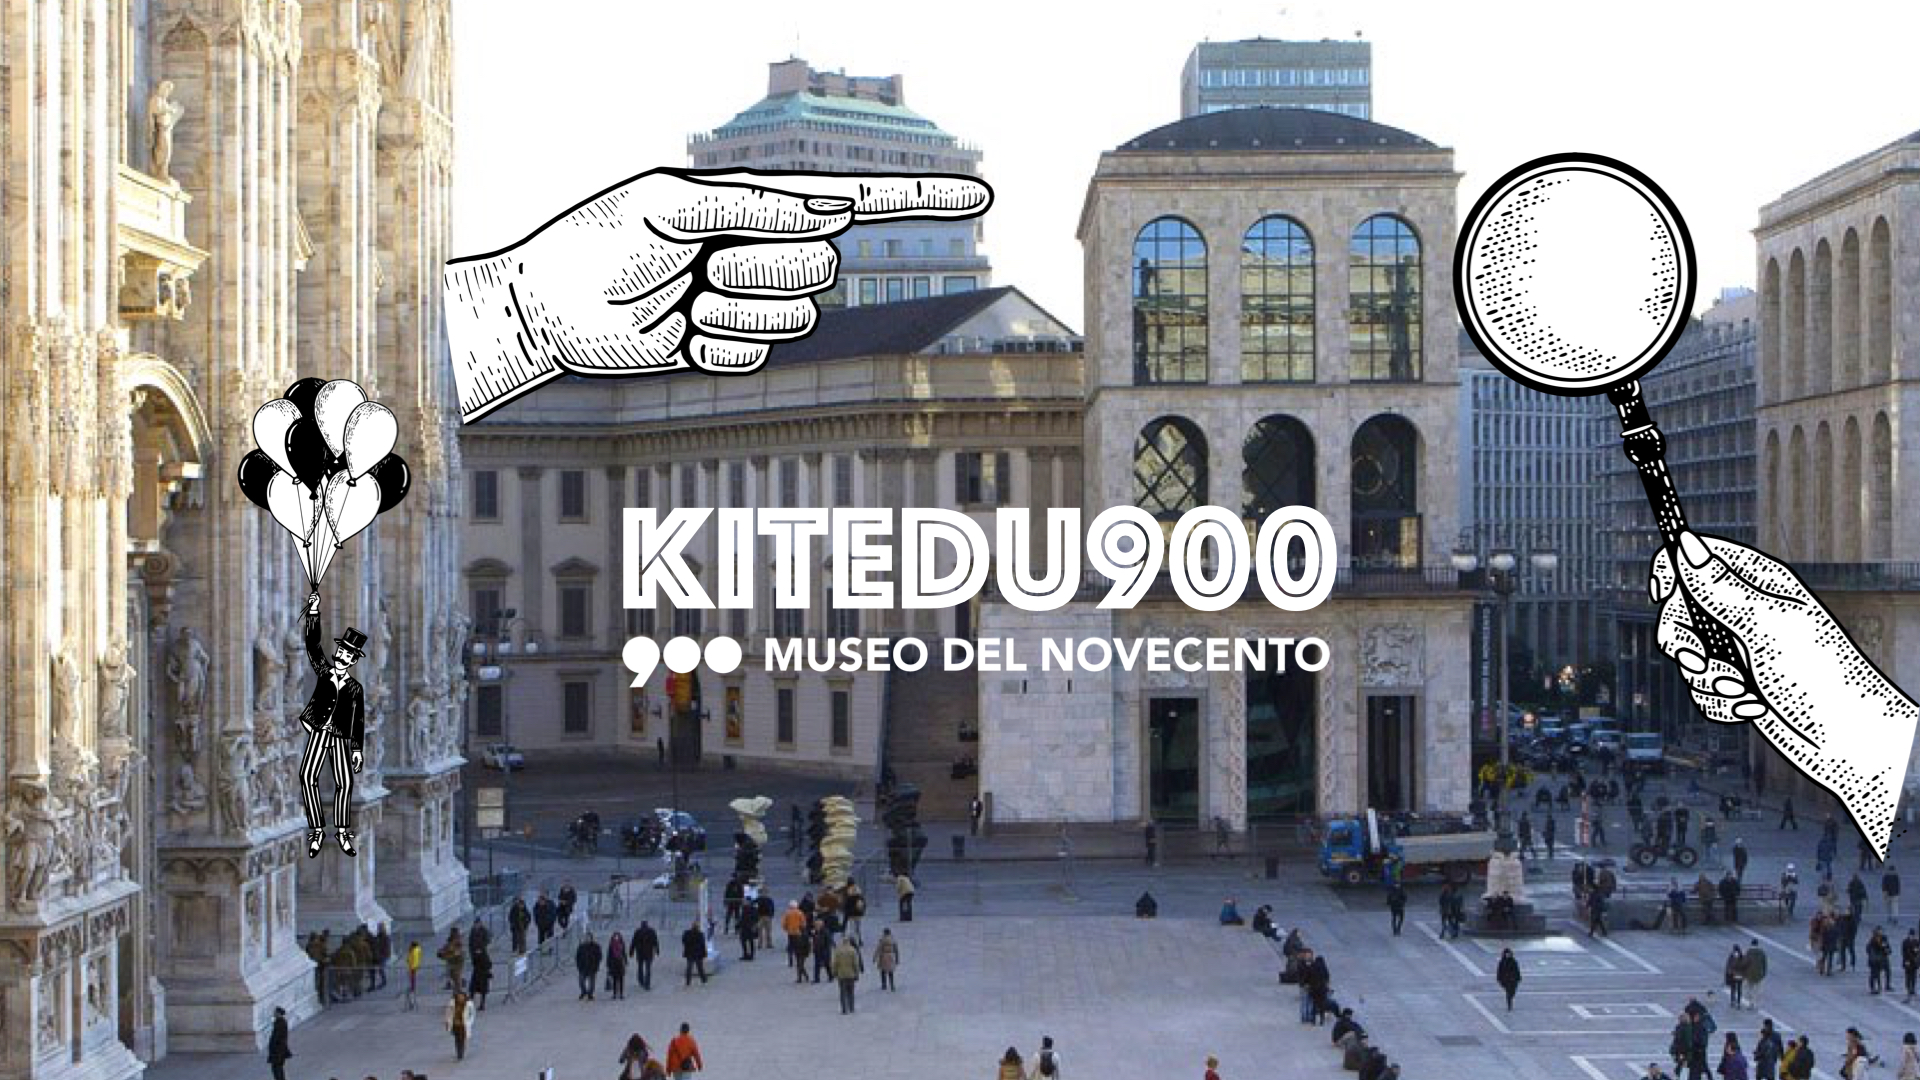 KITEDU900